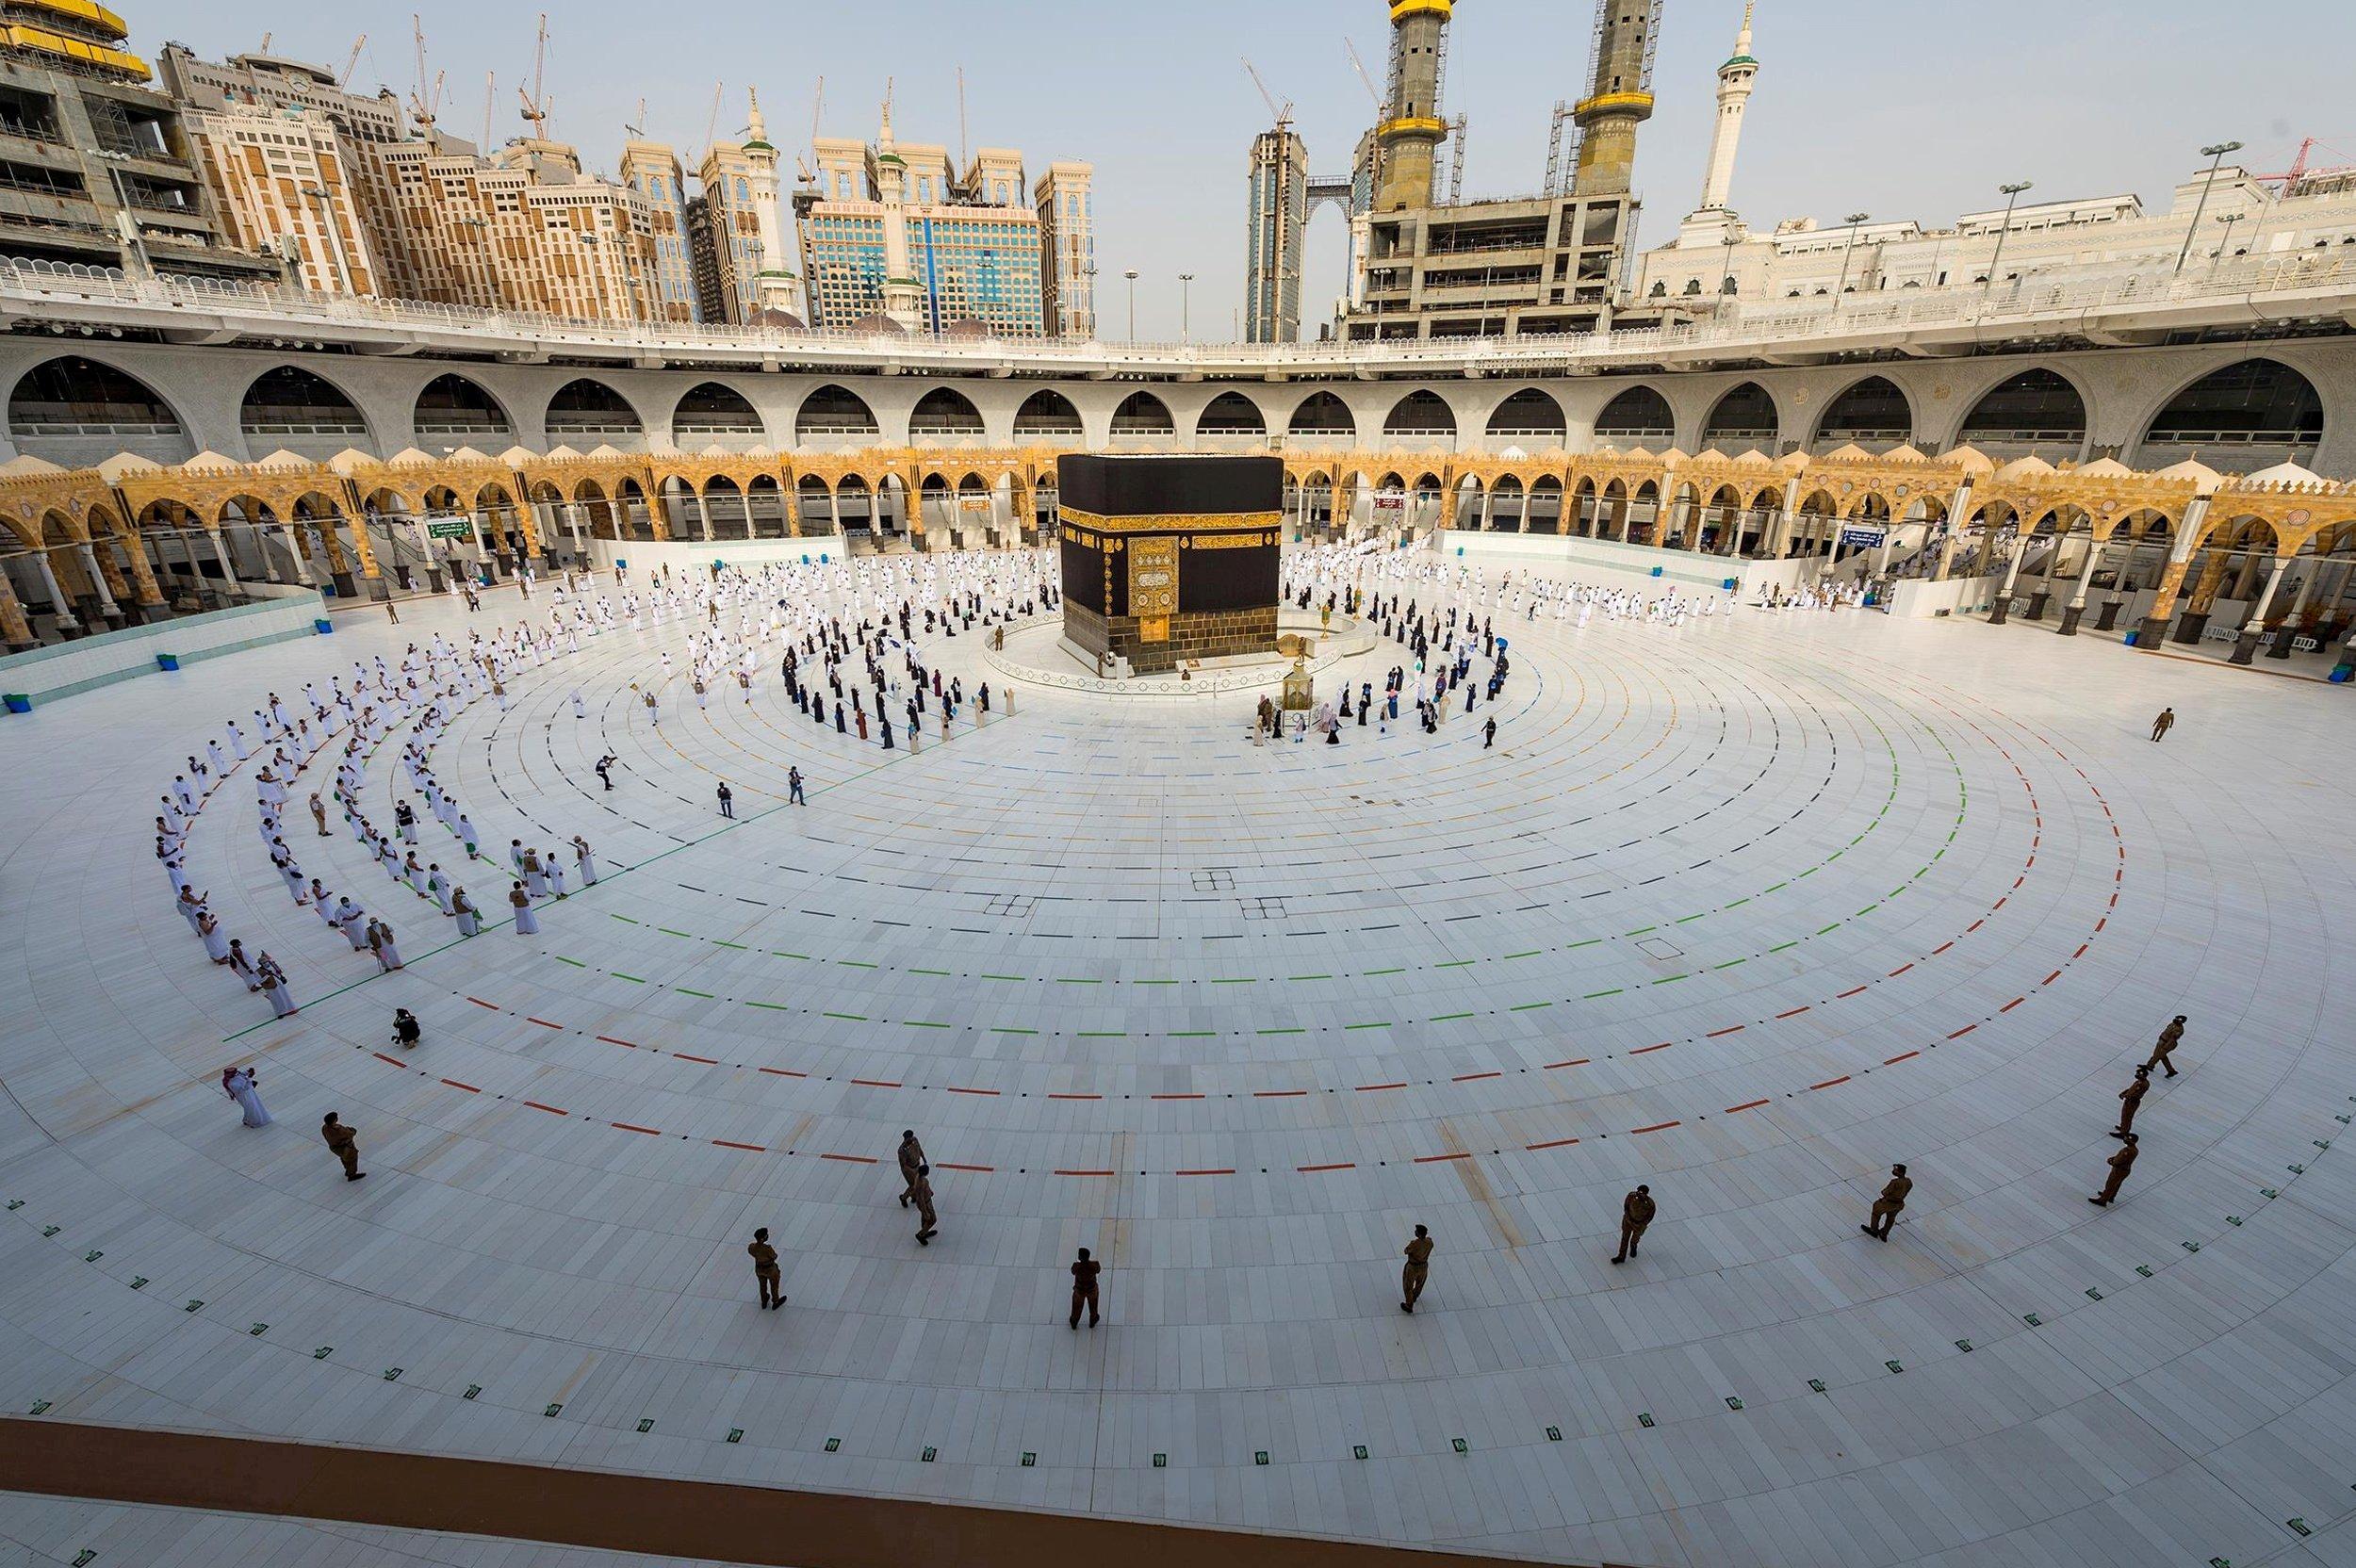 Riyadh may block overseas hajj pilgrims again amid COVID-19 pandemic |  Daily Sabah